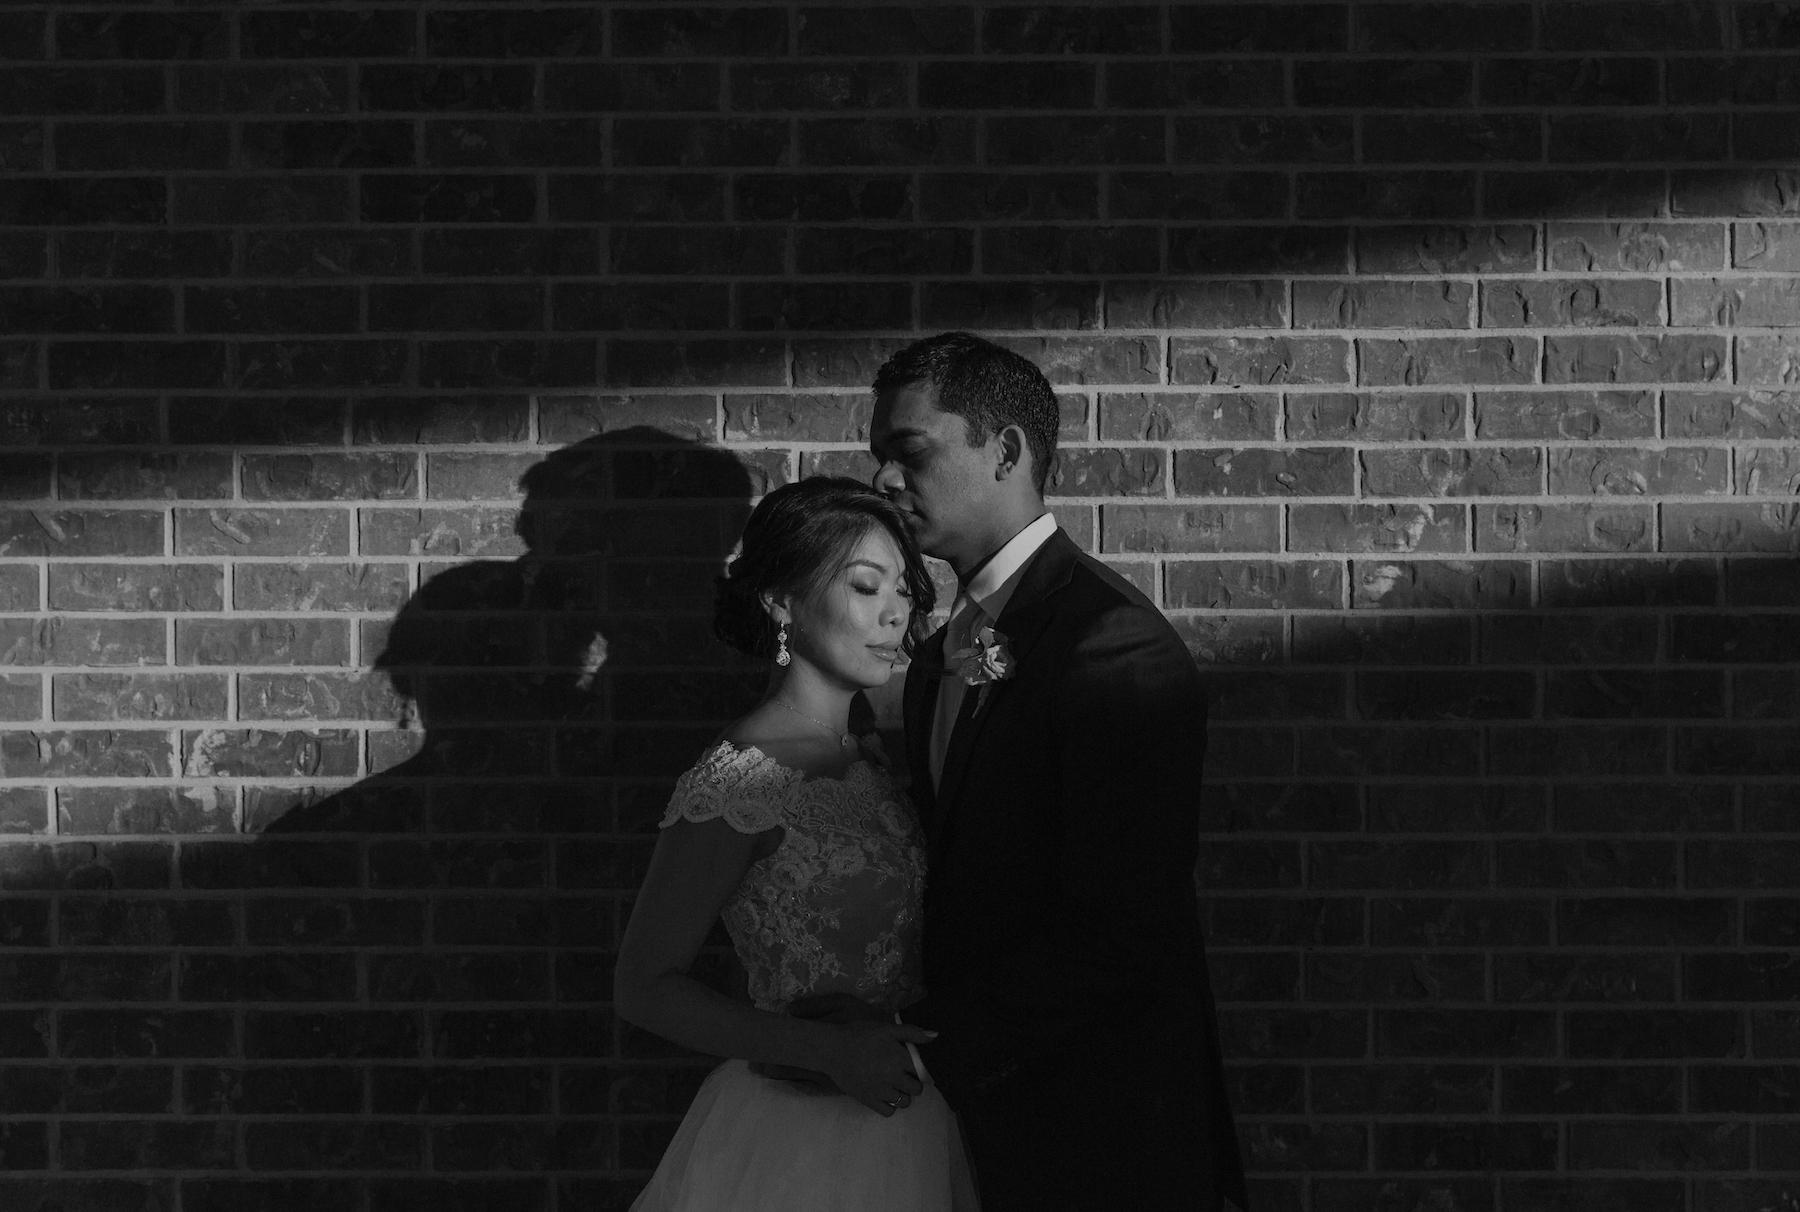 barr-mansion-wedding-austin-texas8877.JPG